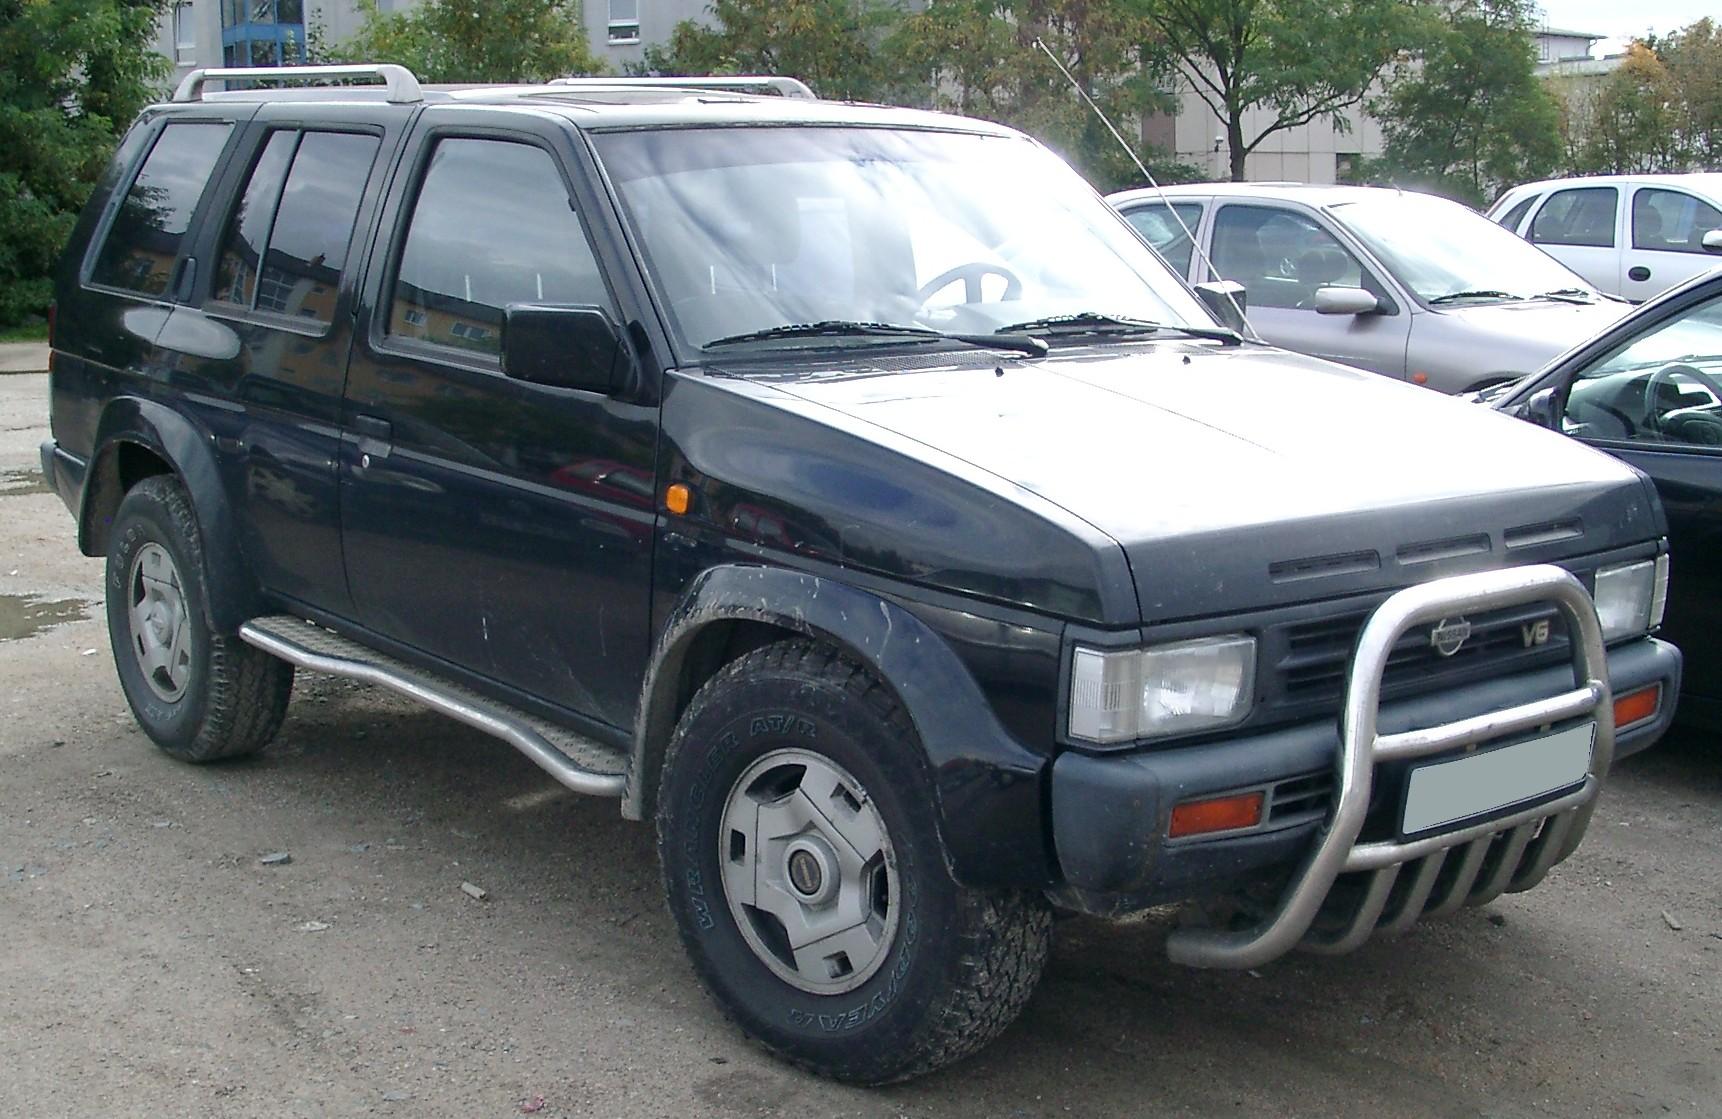 Nissan_Terrano_front_20070926.jpg